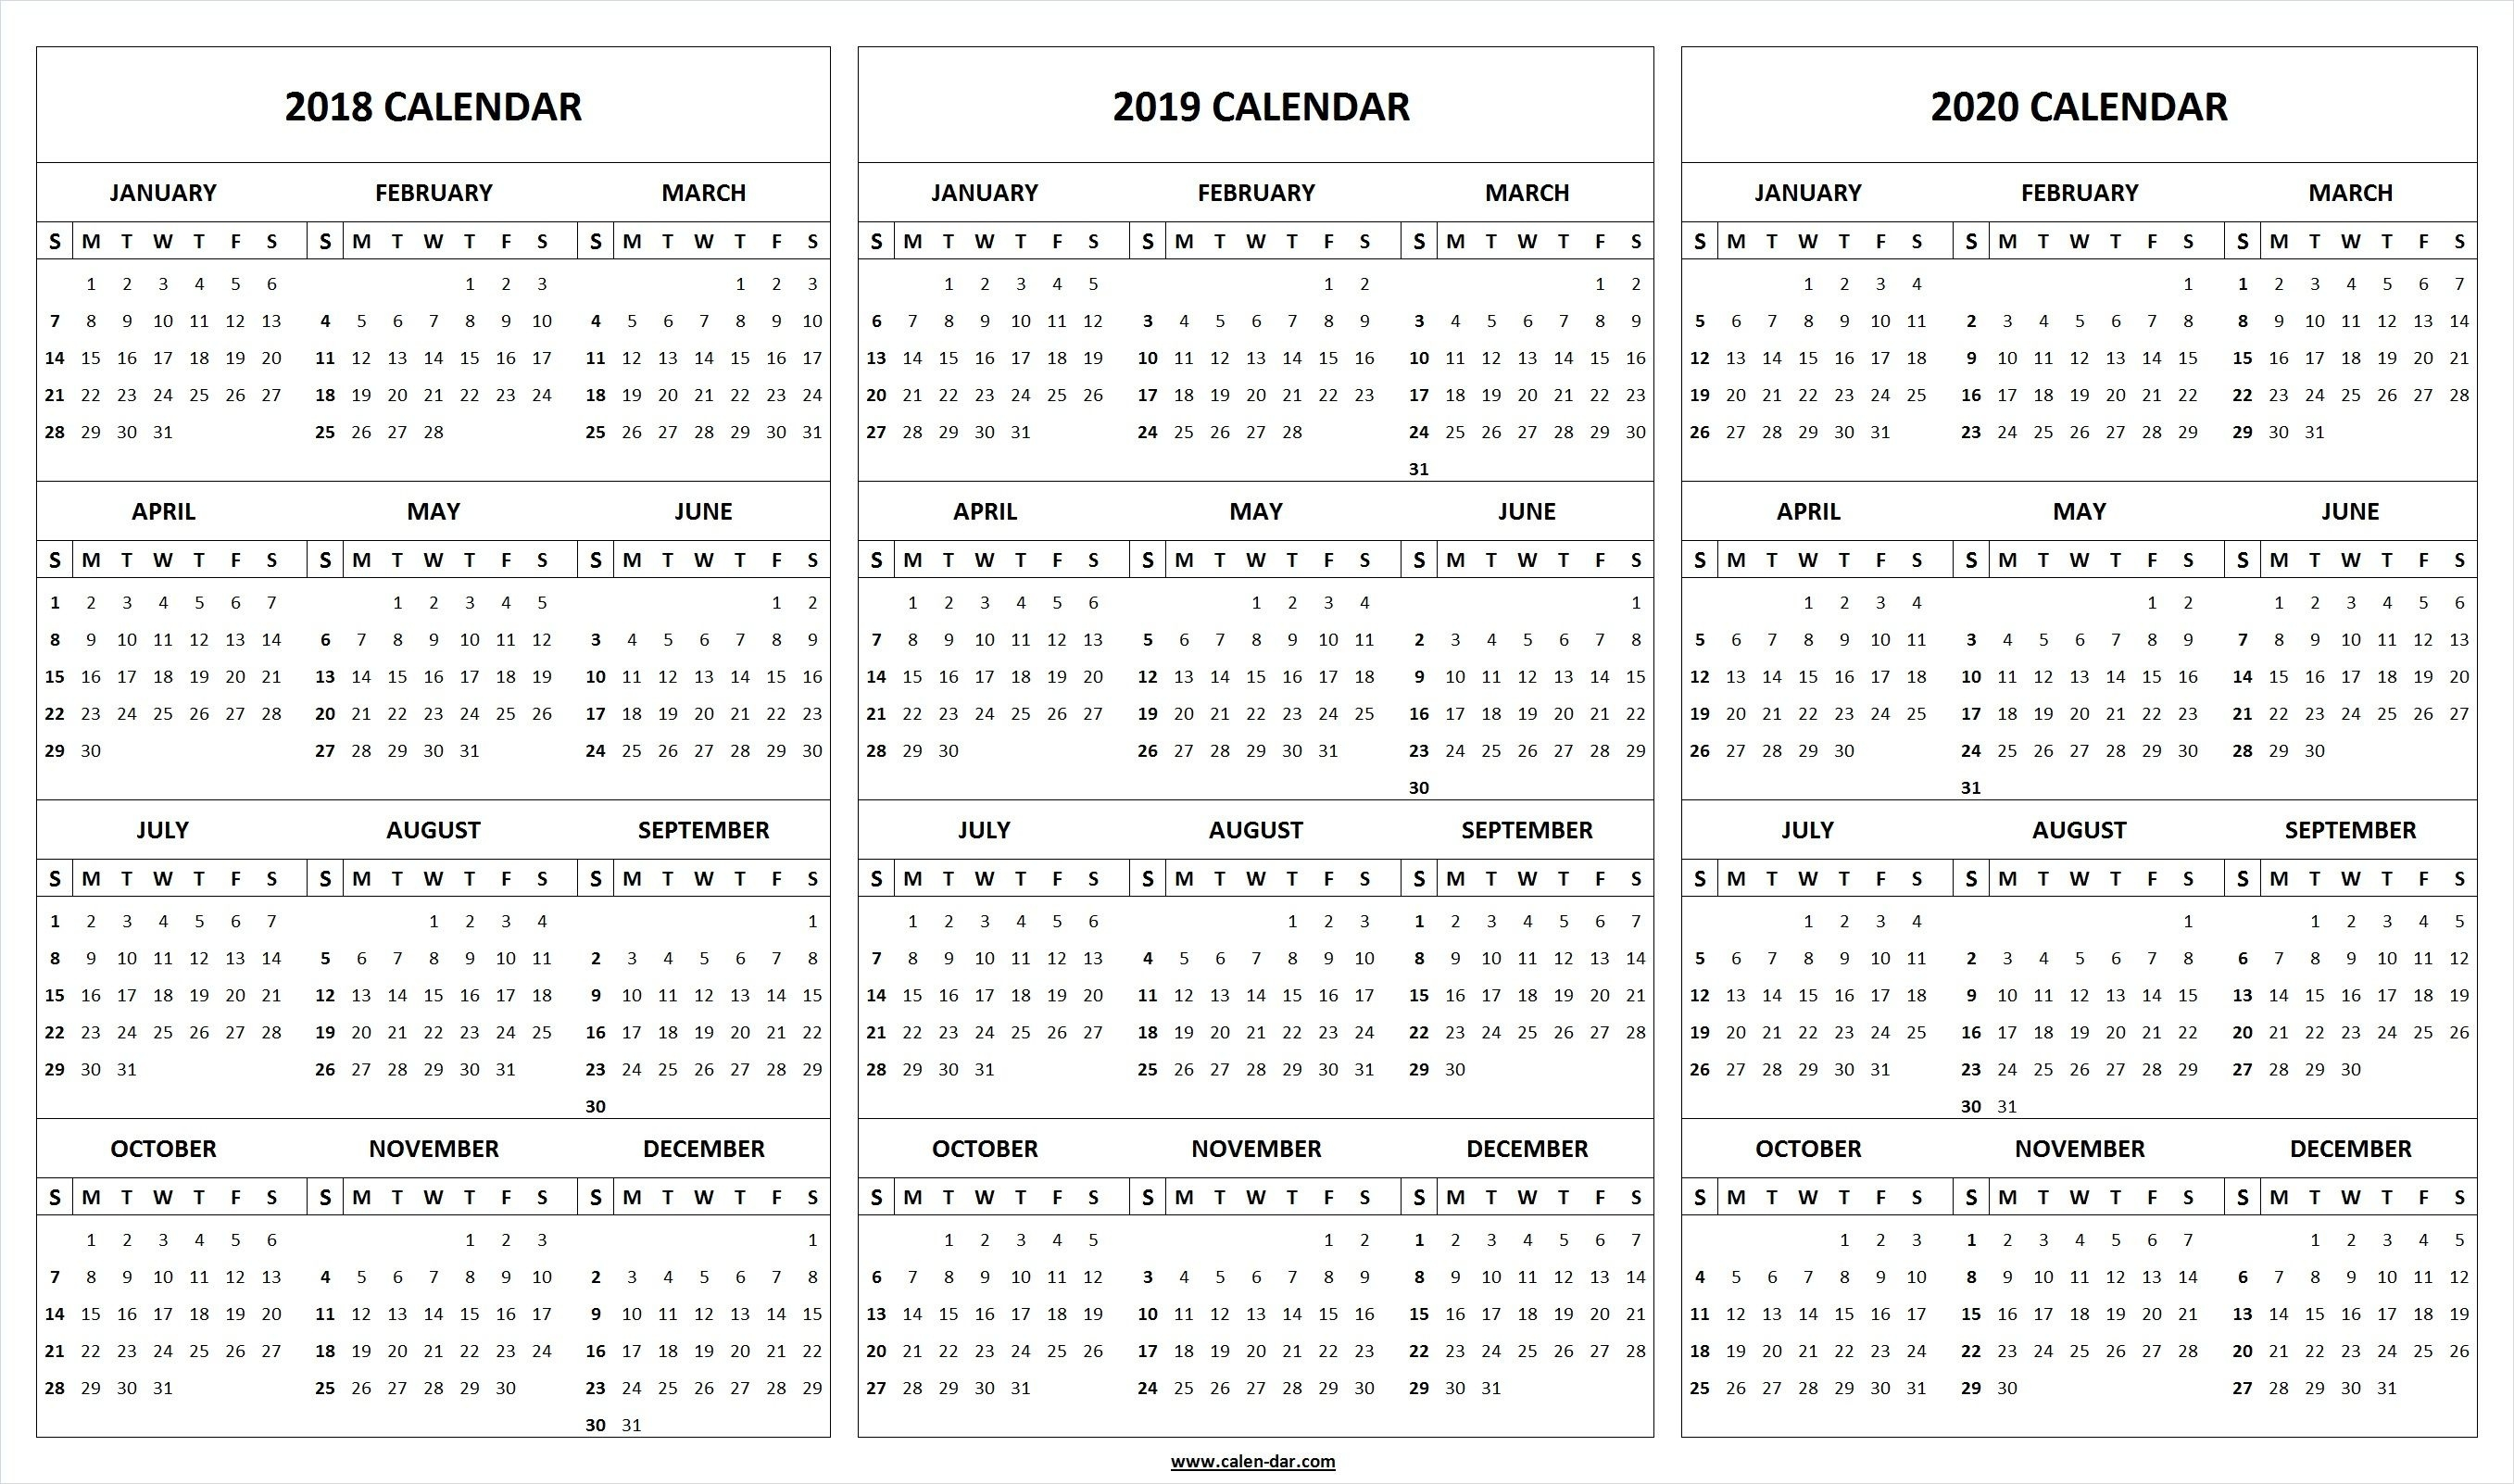 Print Blank 2018 2019 2020 Calendar Template | Organize! | 2019_3 Month Blank Calendar 2020